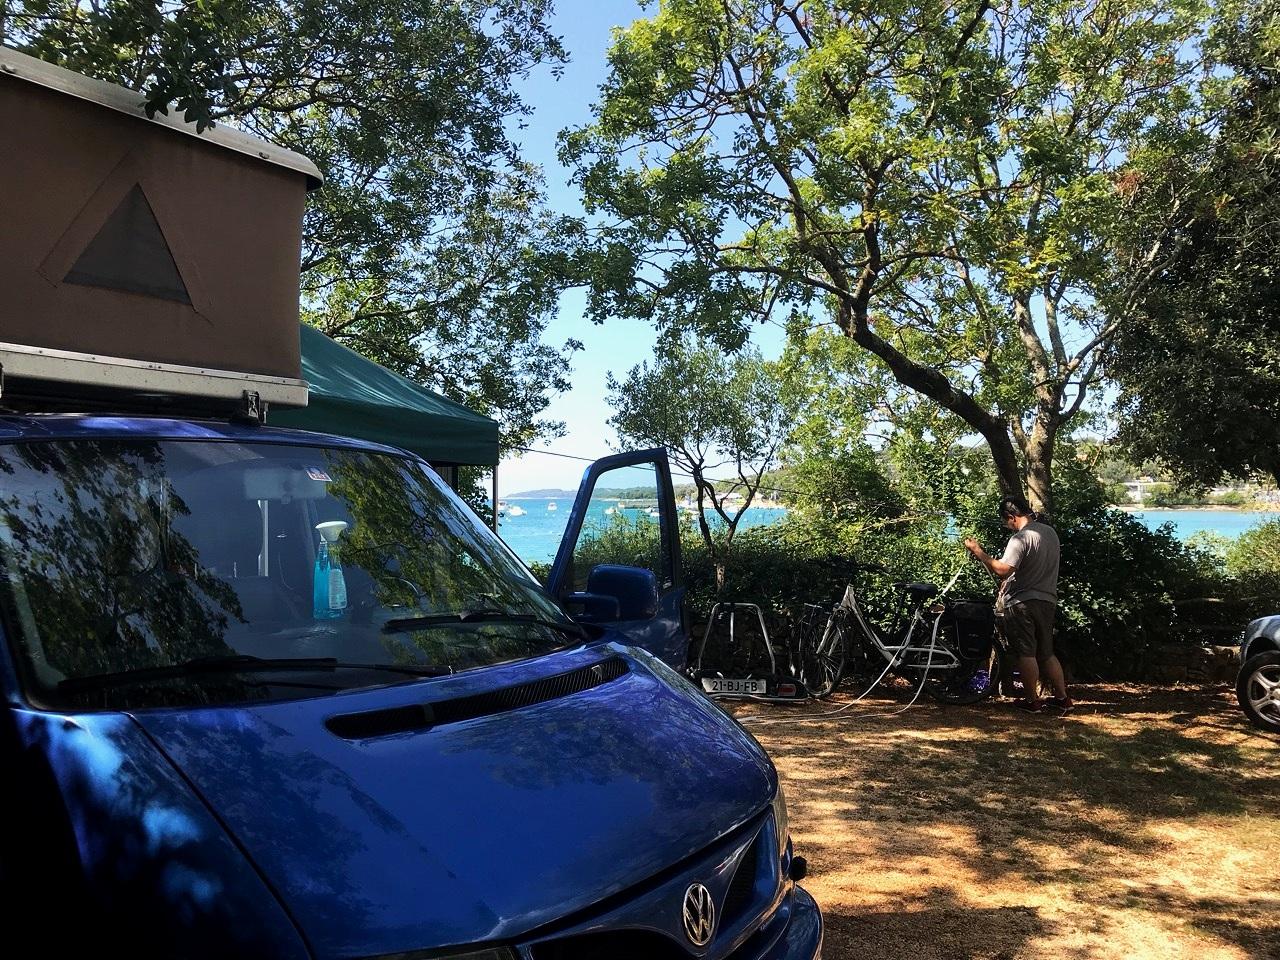 Camp Mon Paradis